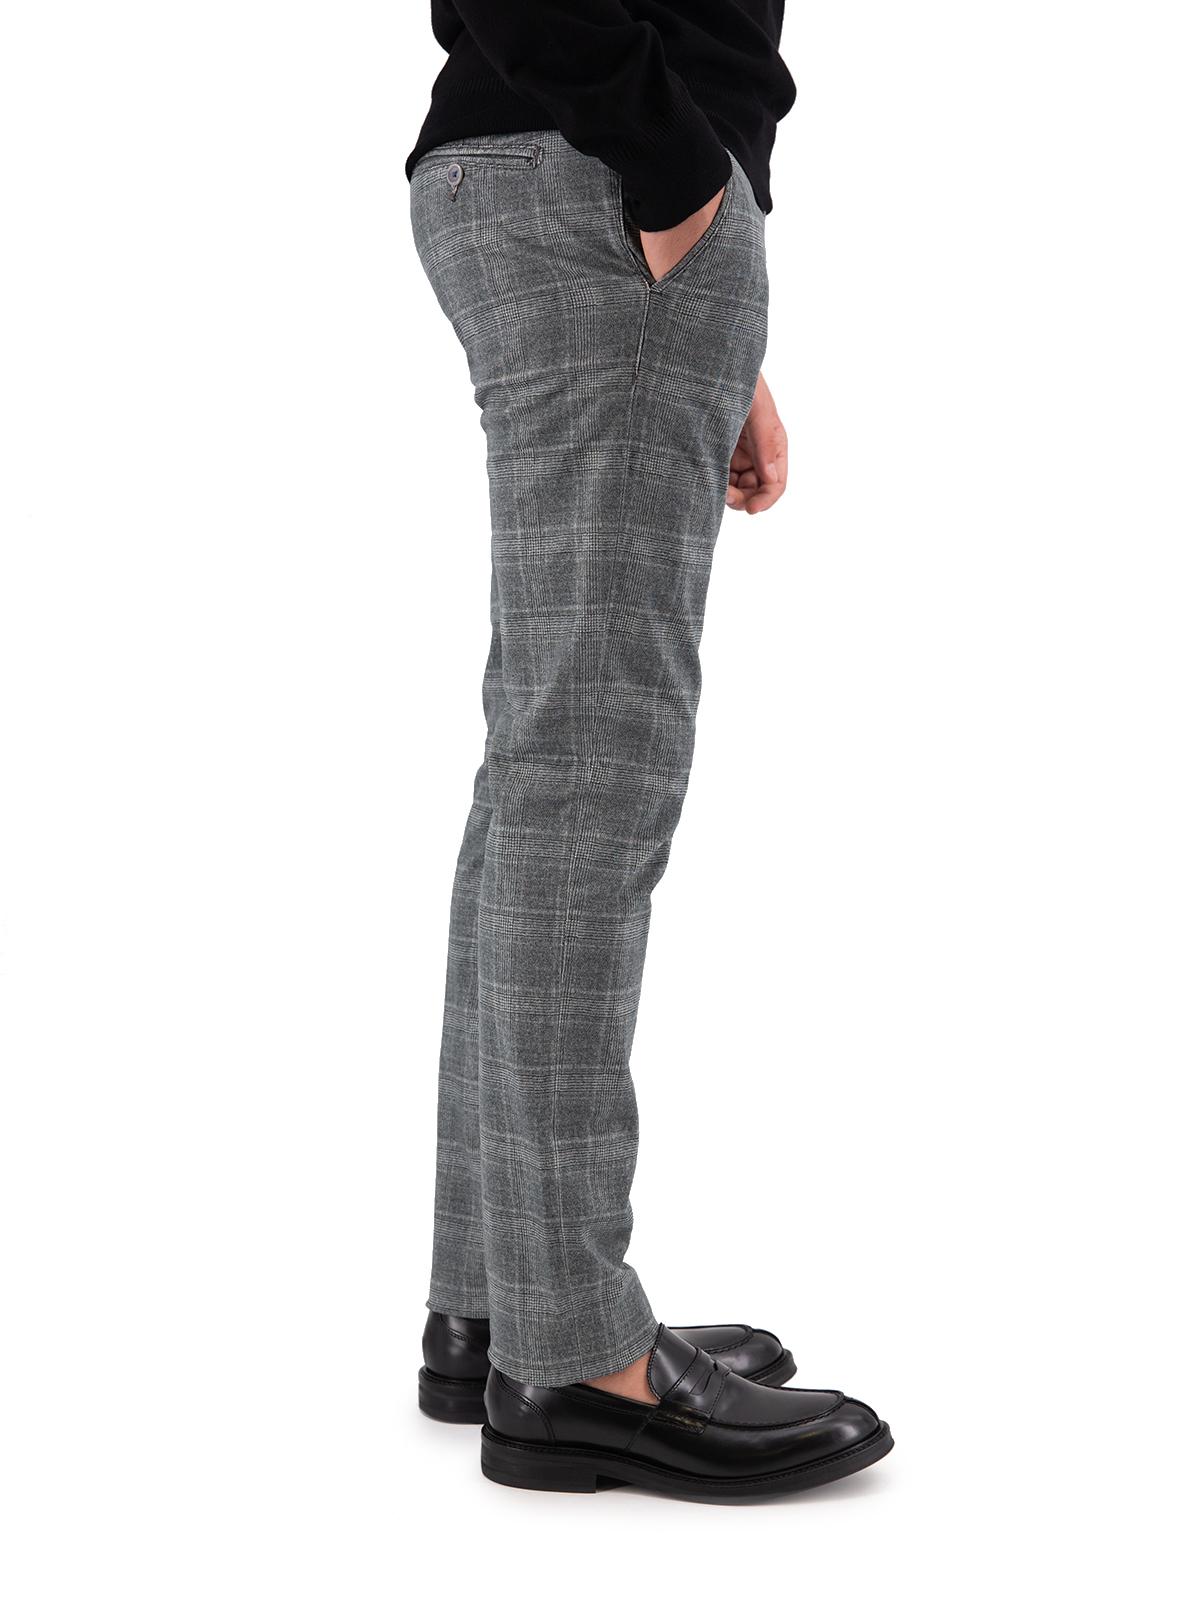 Teleria Zed Pantalone ROBIN F17 QMD